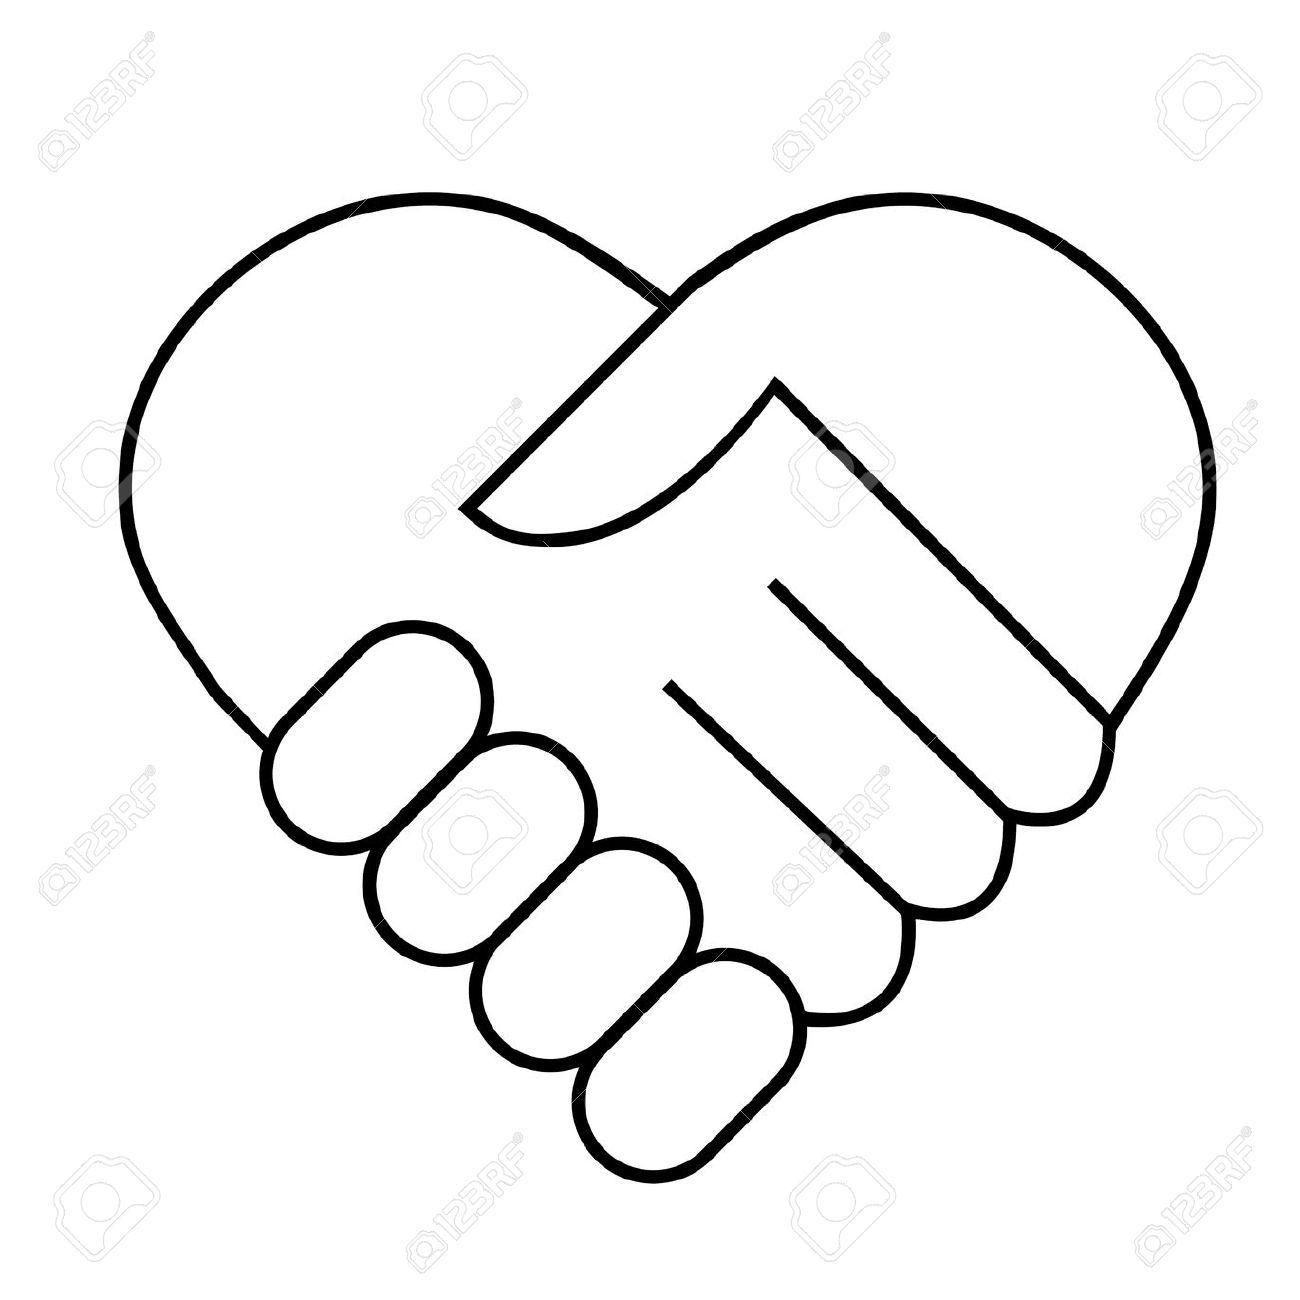 Hand we are family. Handshake clipart heart